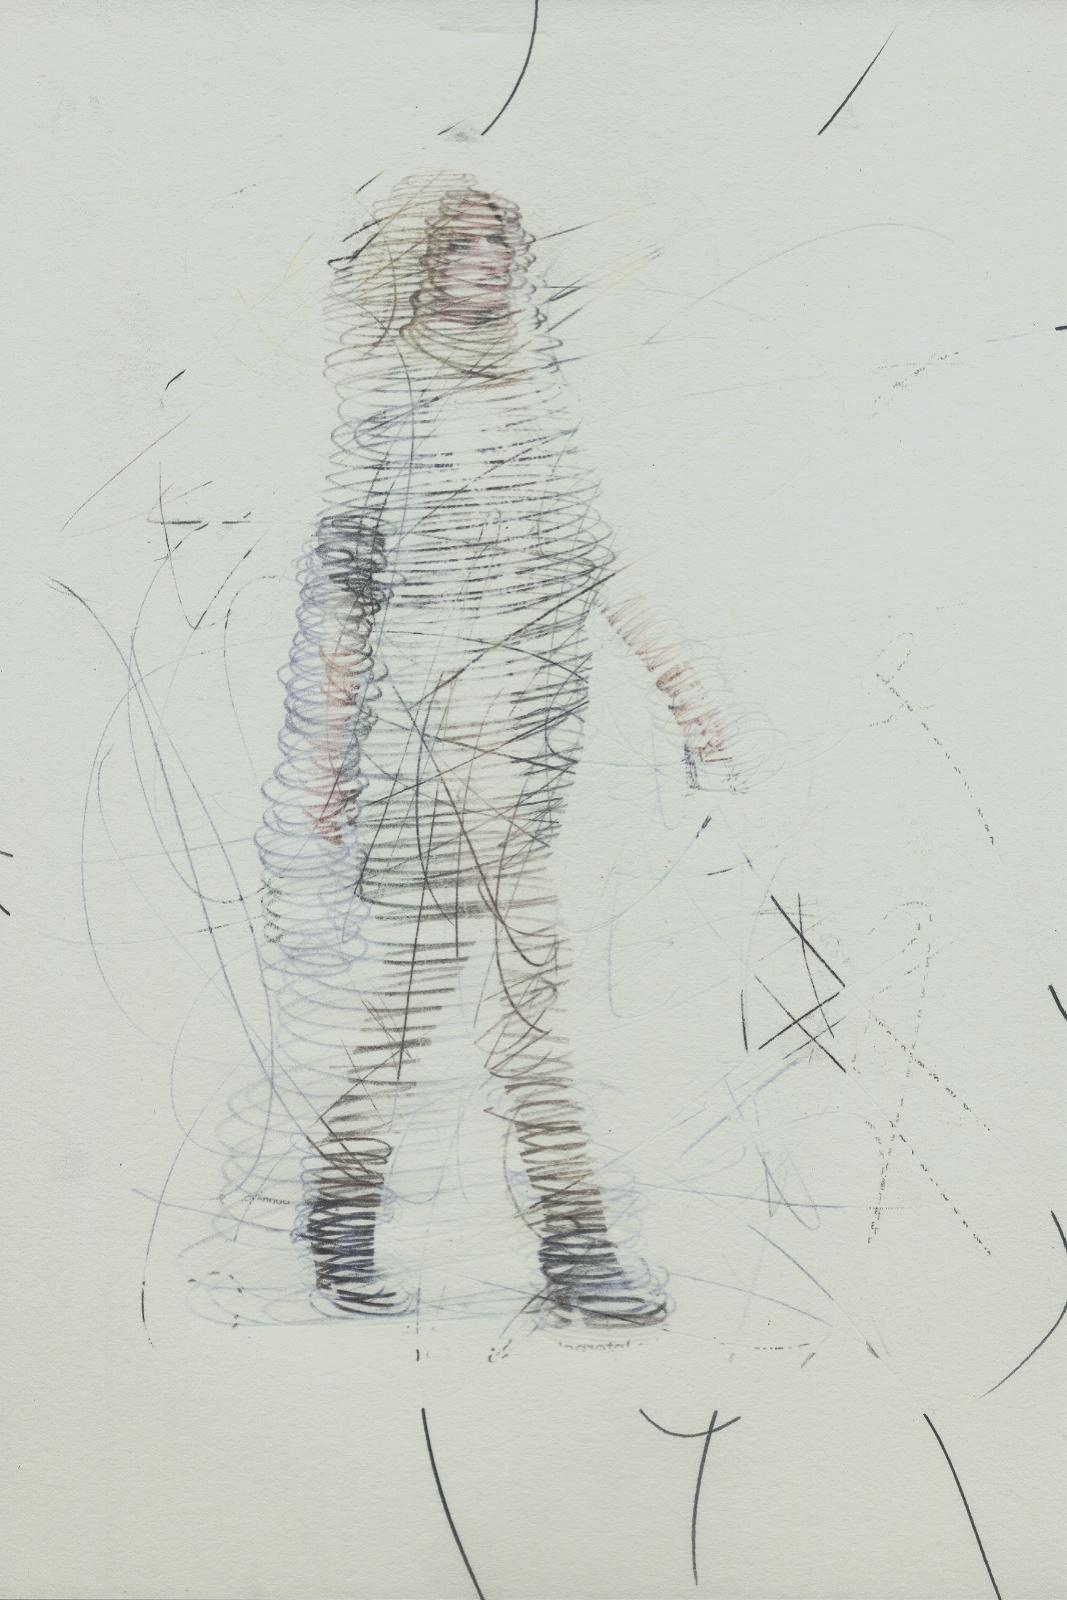 Spin #02, 2014, Lavender-Oil transferprint, pencil, 21 x 28 cm